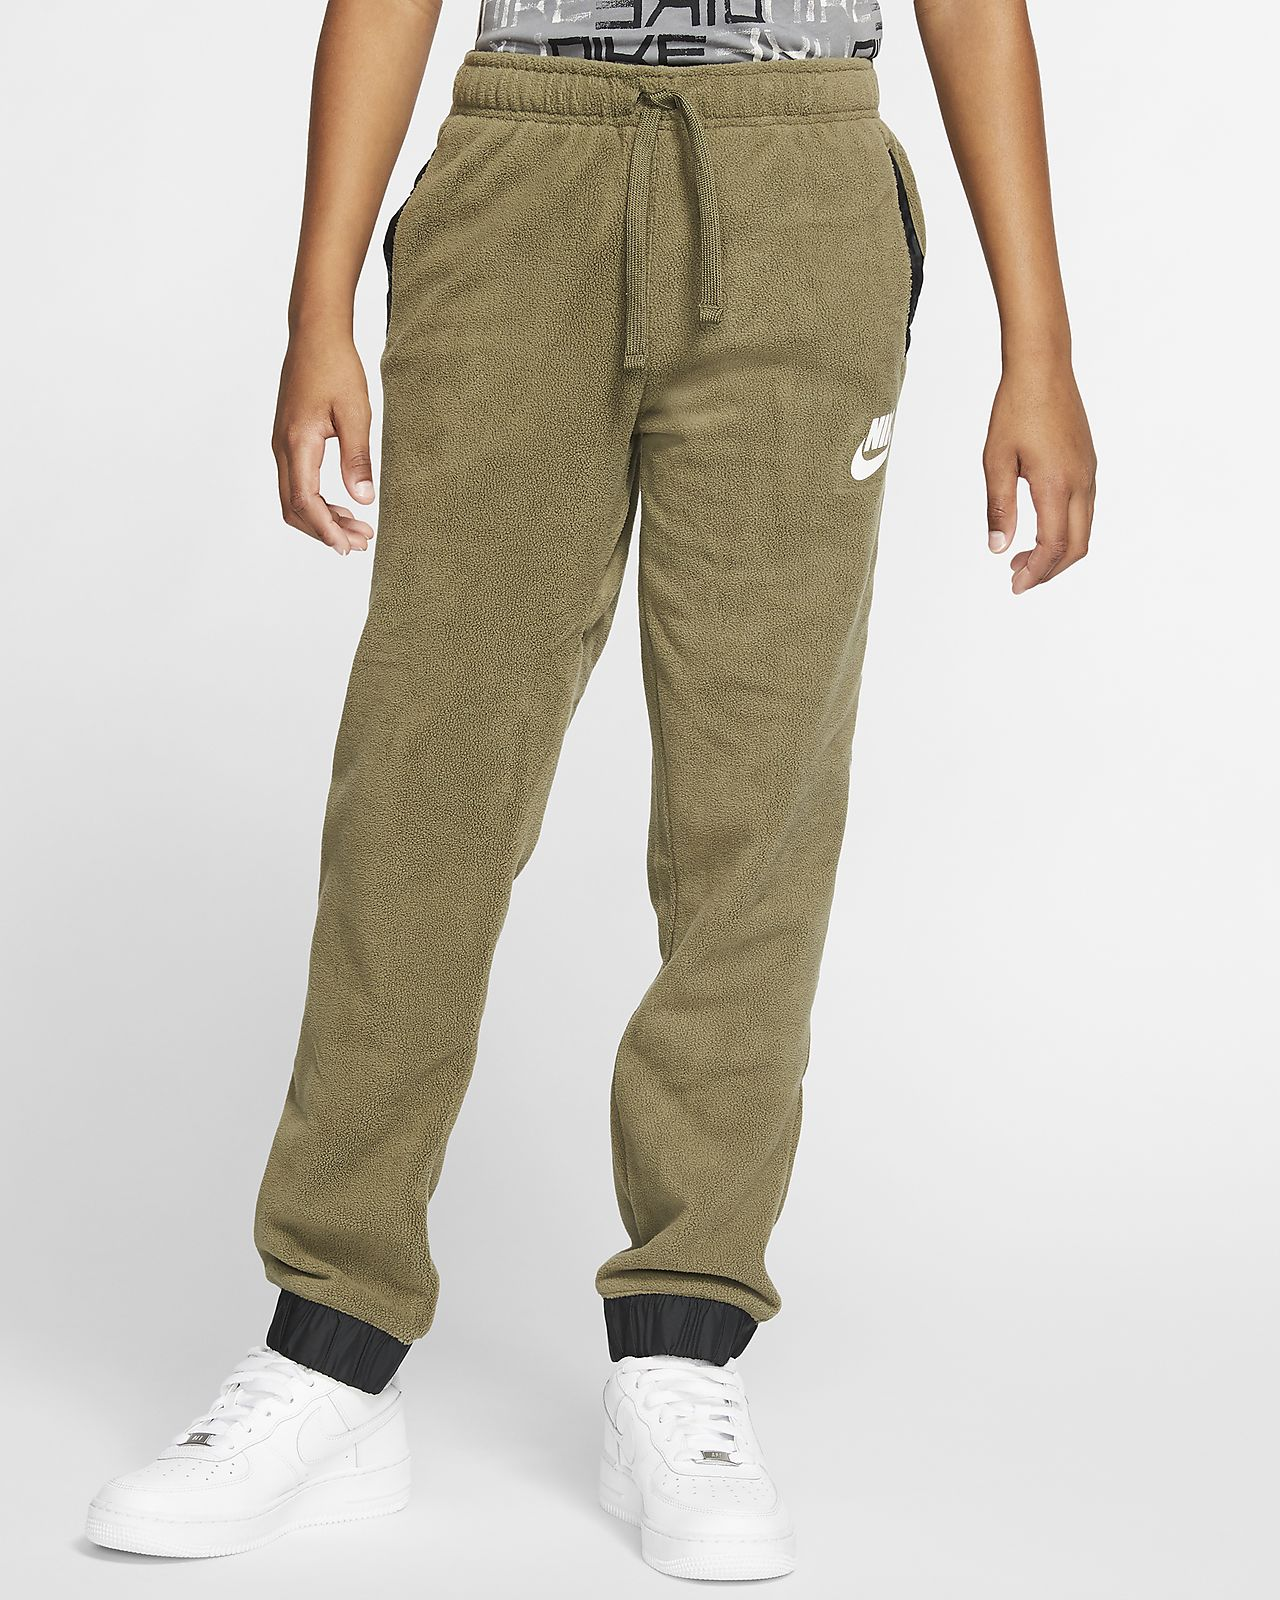 Nike Sportswear Winterized-Nike-bukser til store børn (drenge)